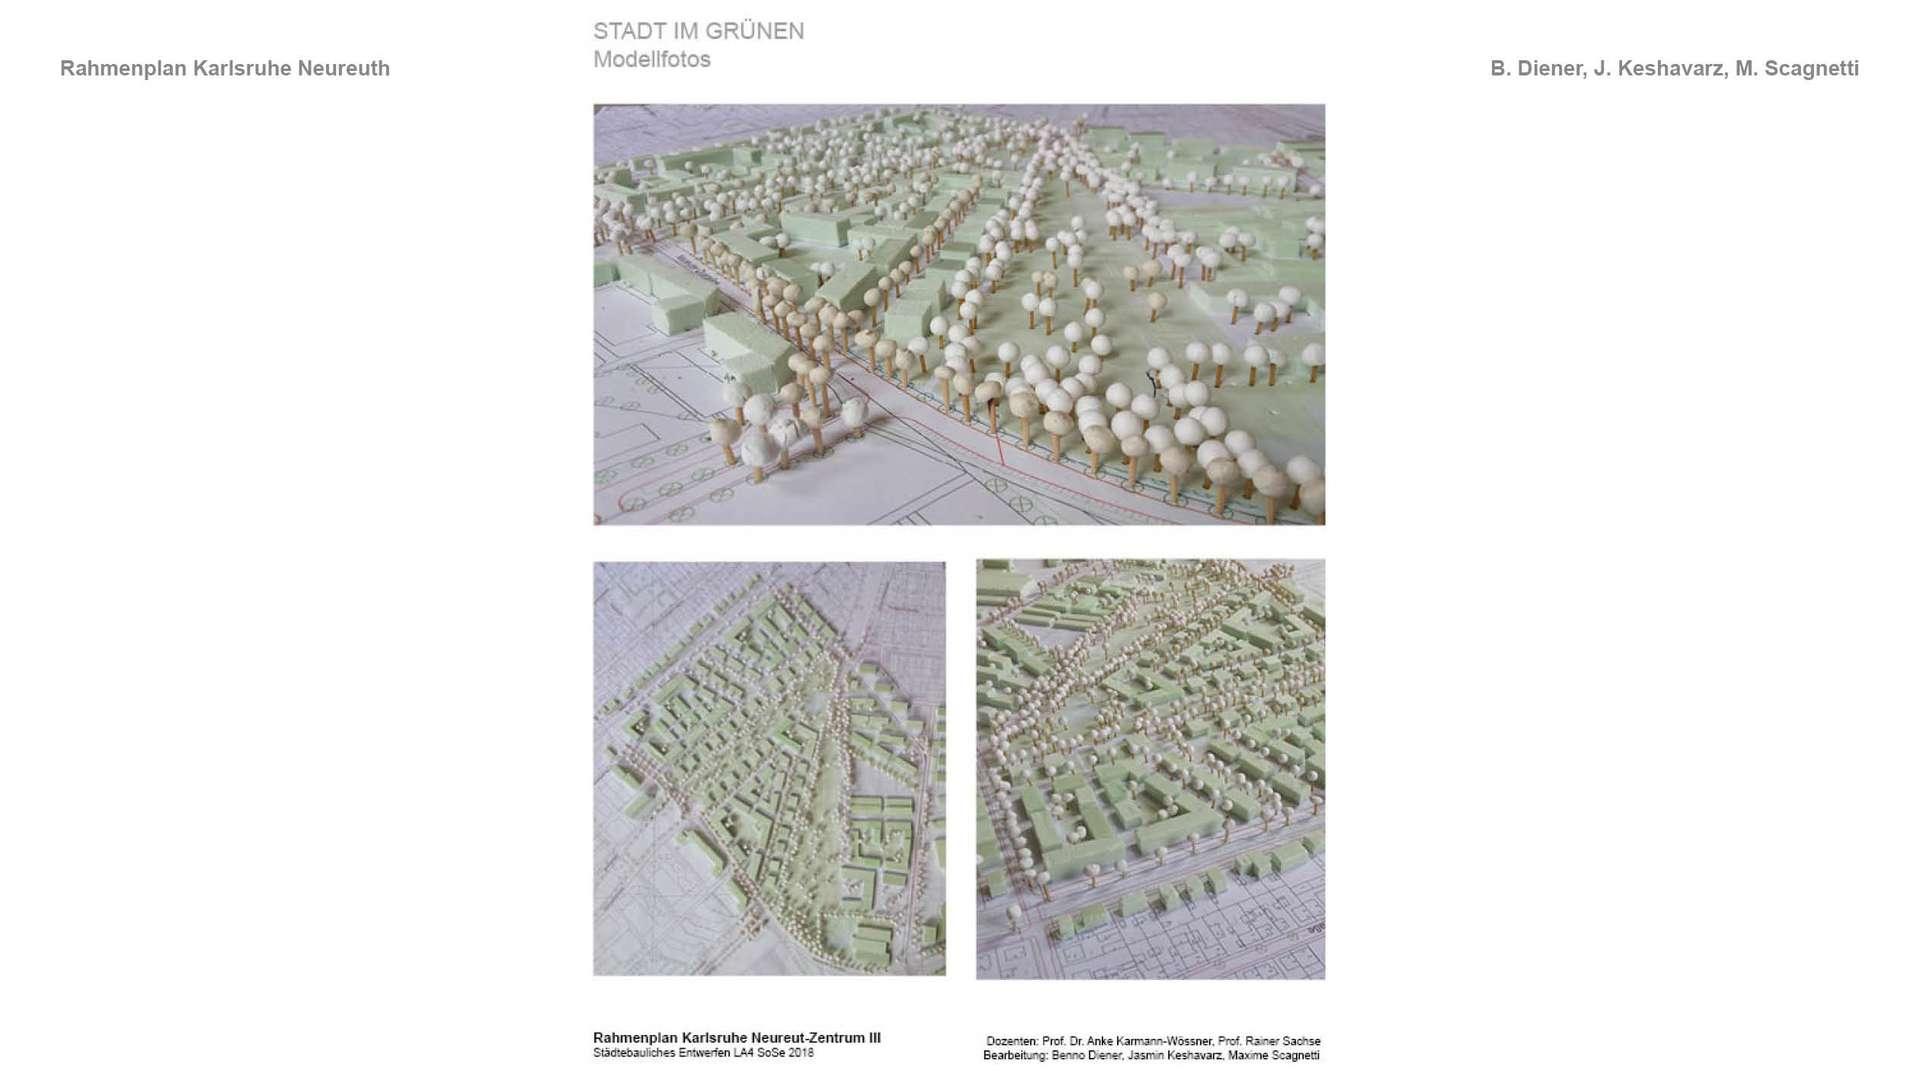 07 Rahmenkonzept Karlsruhe Neureuth